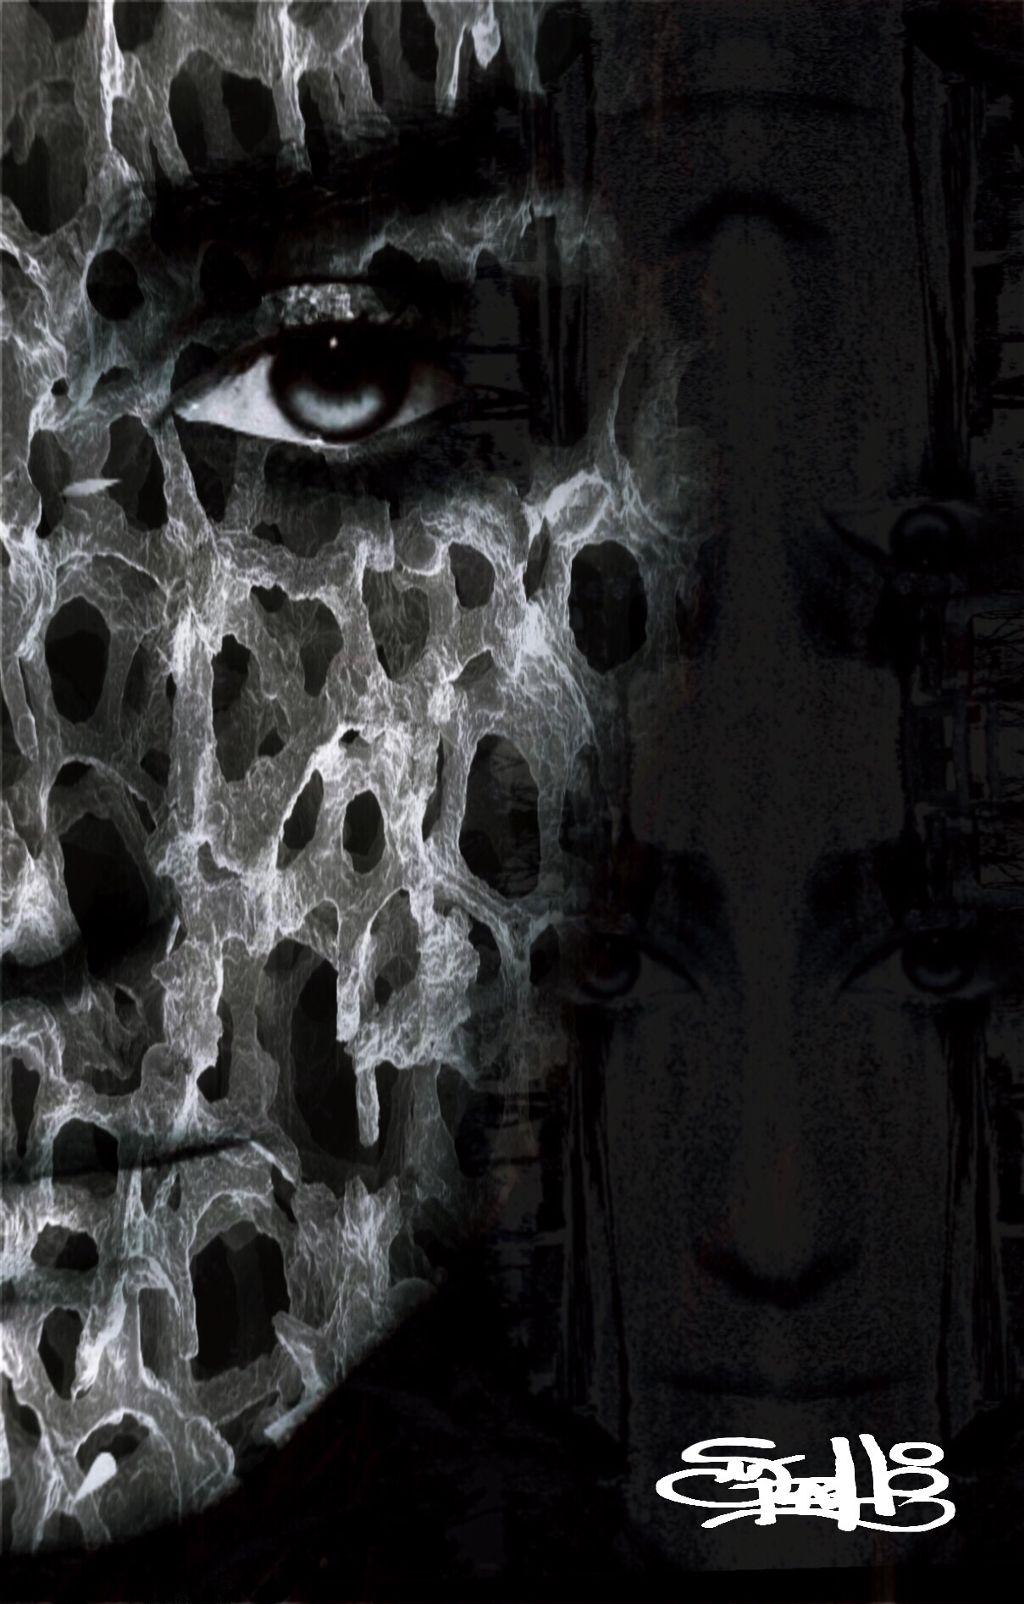 #shadowselfie #dark #darkart #abstract #artistic #art #interesting        #edited pic by @gizemkarayavuz